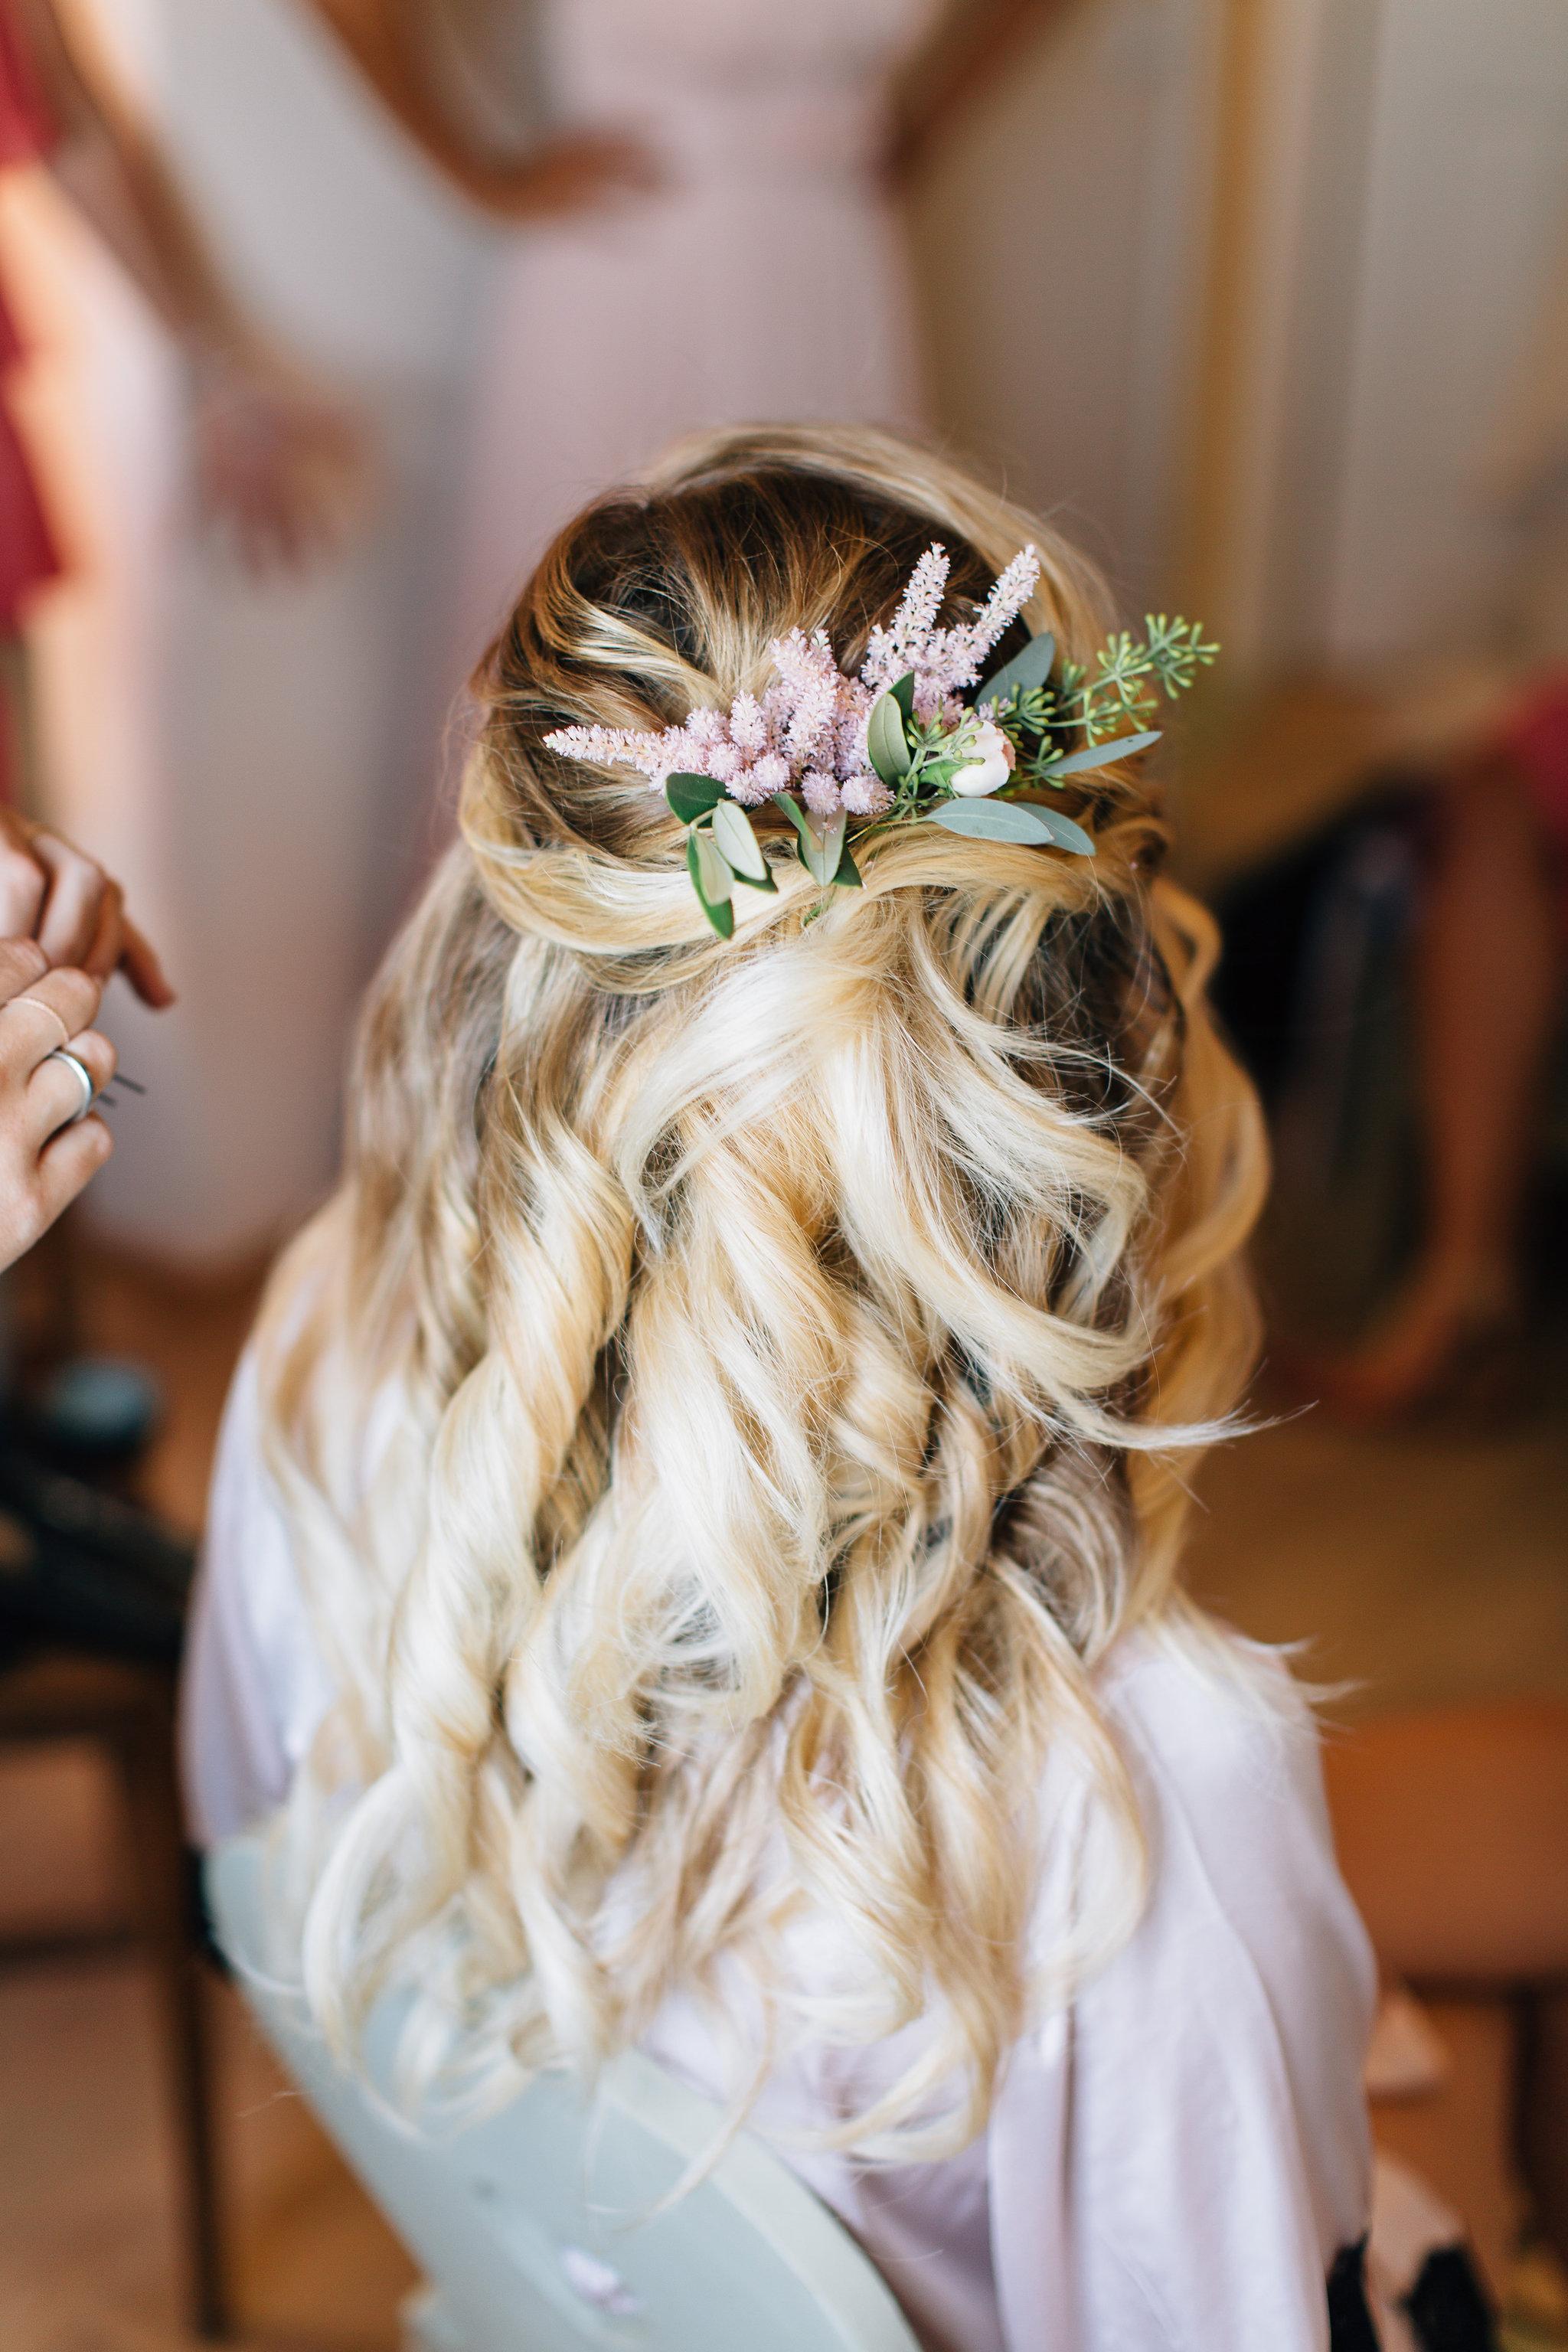 (c) Bridelights Photography